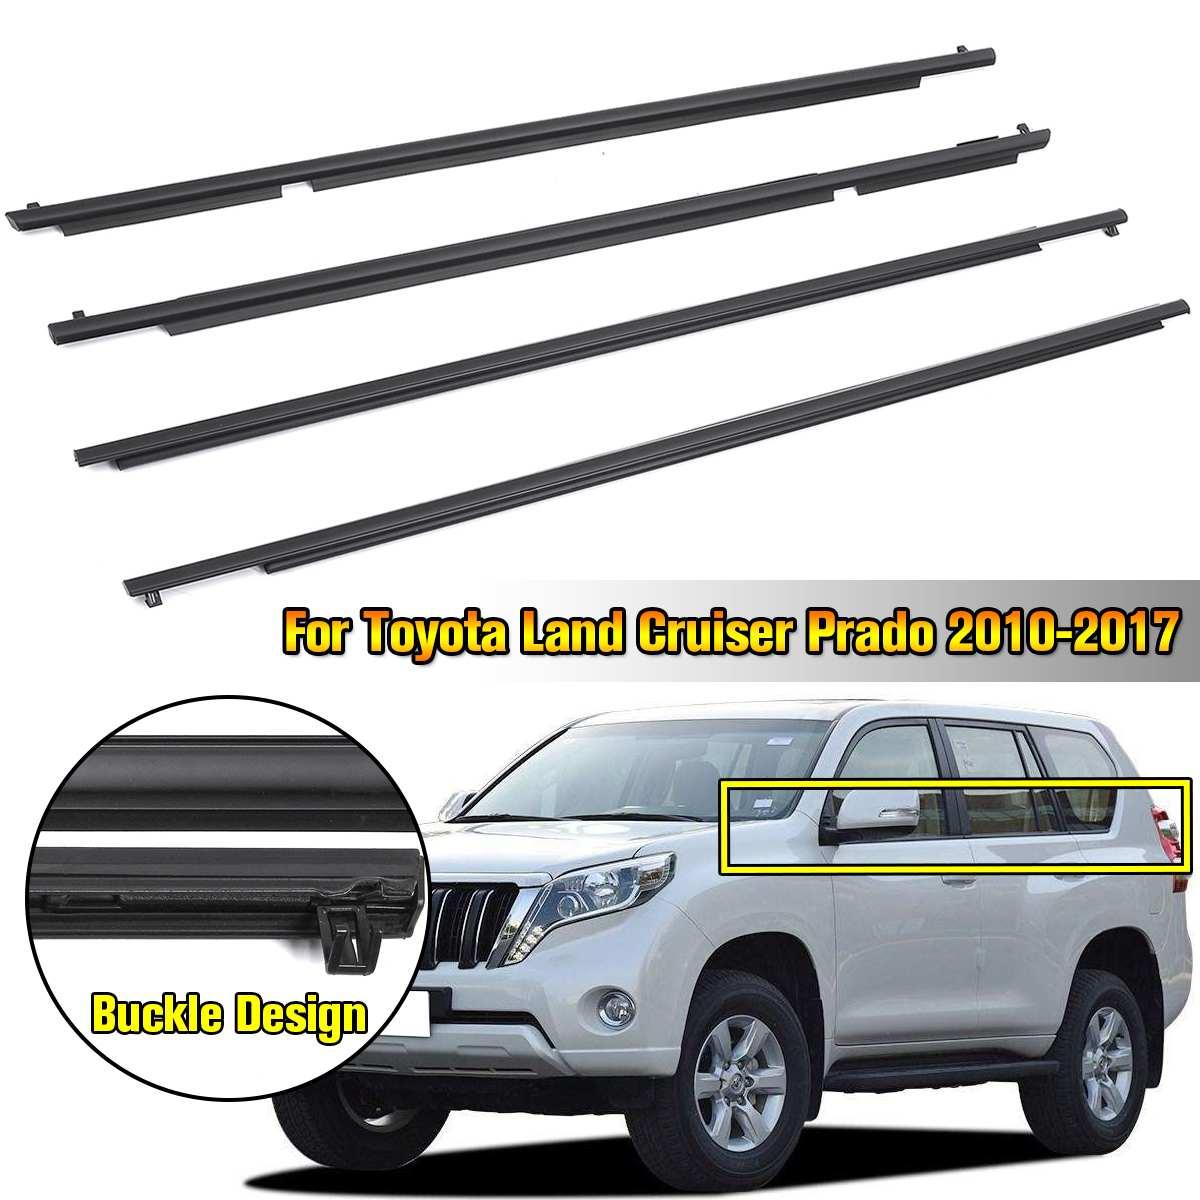 4 Uds. Ventana puerta cinturón moldura embellecedores clima-tira viento lluvia Deflector Set para Toyota Land Cruiser Prado 2010-2017